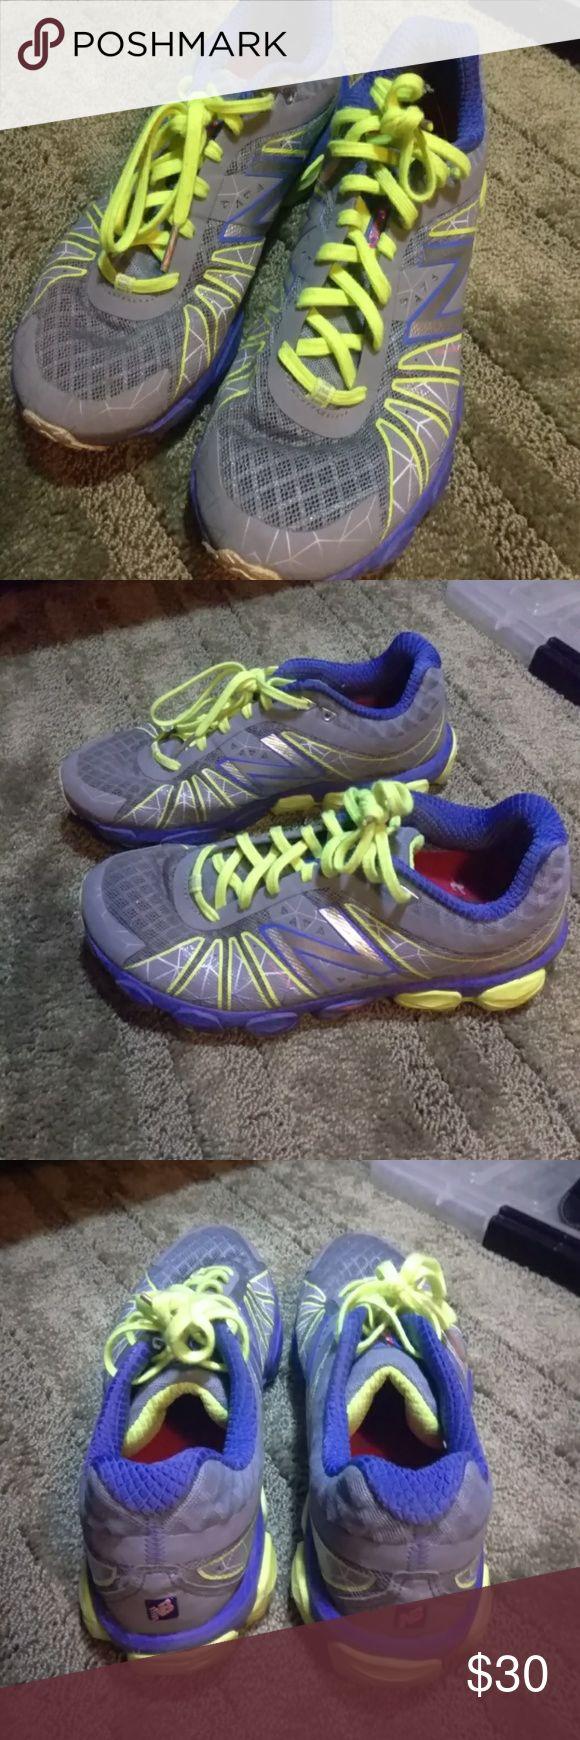 New Balance 890 v4 running shoes size 9 EUC still great for running New Balance Shoes Athletic Shoes